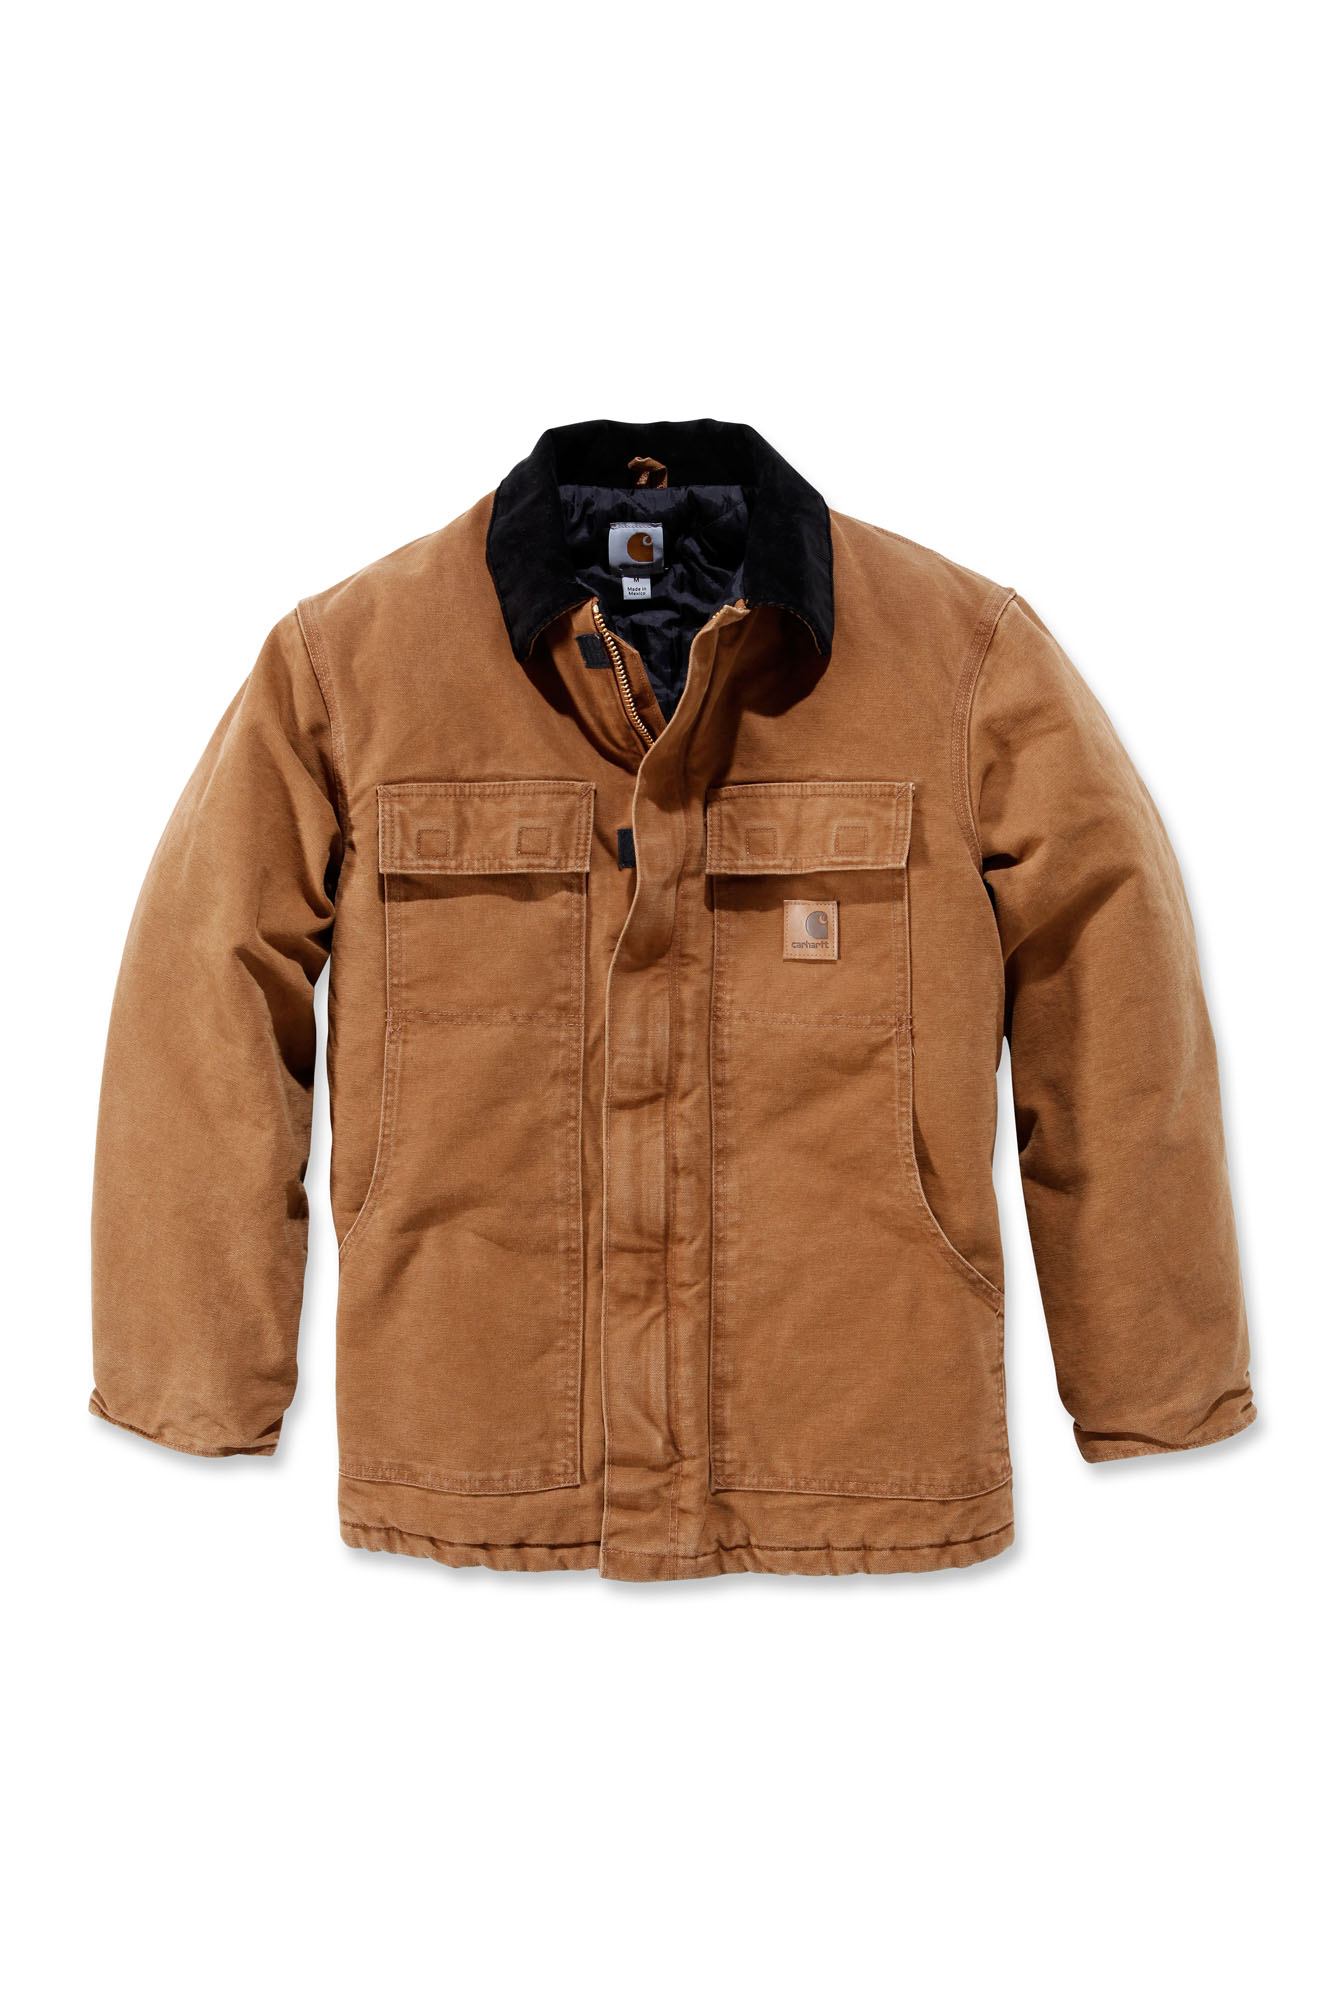 carhartt 39 c26 sandstone traditional coat mens new workwear jacket ebay. Black Bedroom Furniture Sets. Home Design Ideas